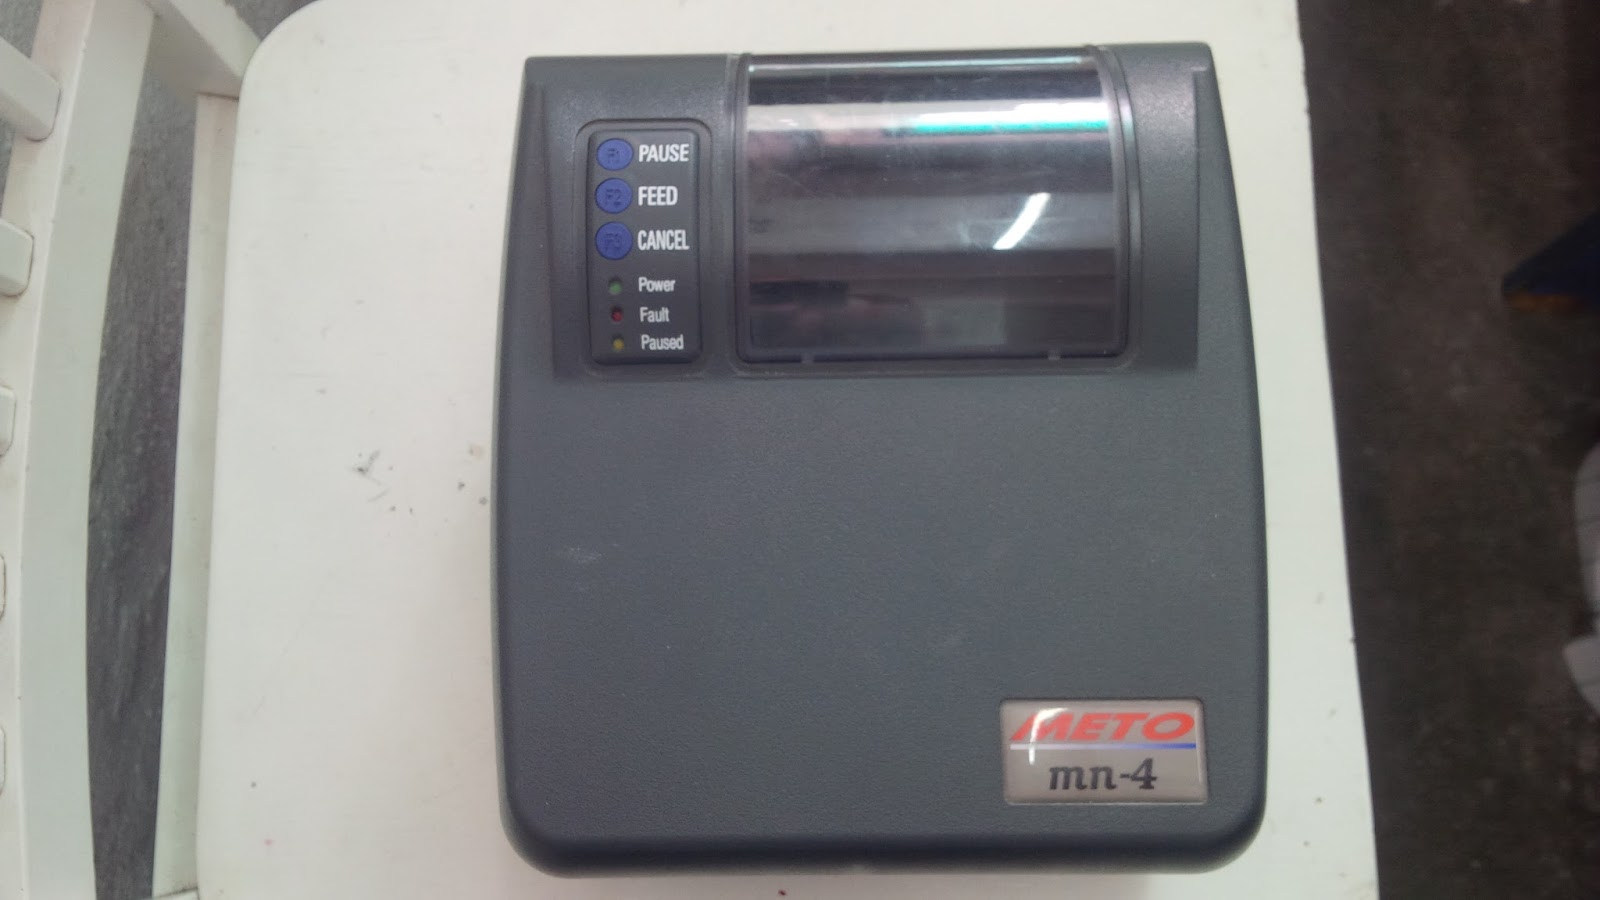 METO MN 4203 PRINTER WINDOWS 10 DOWNLOAD DRIVER